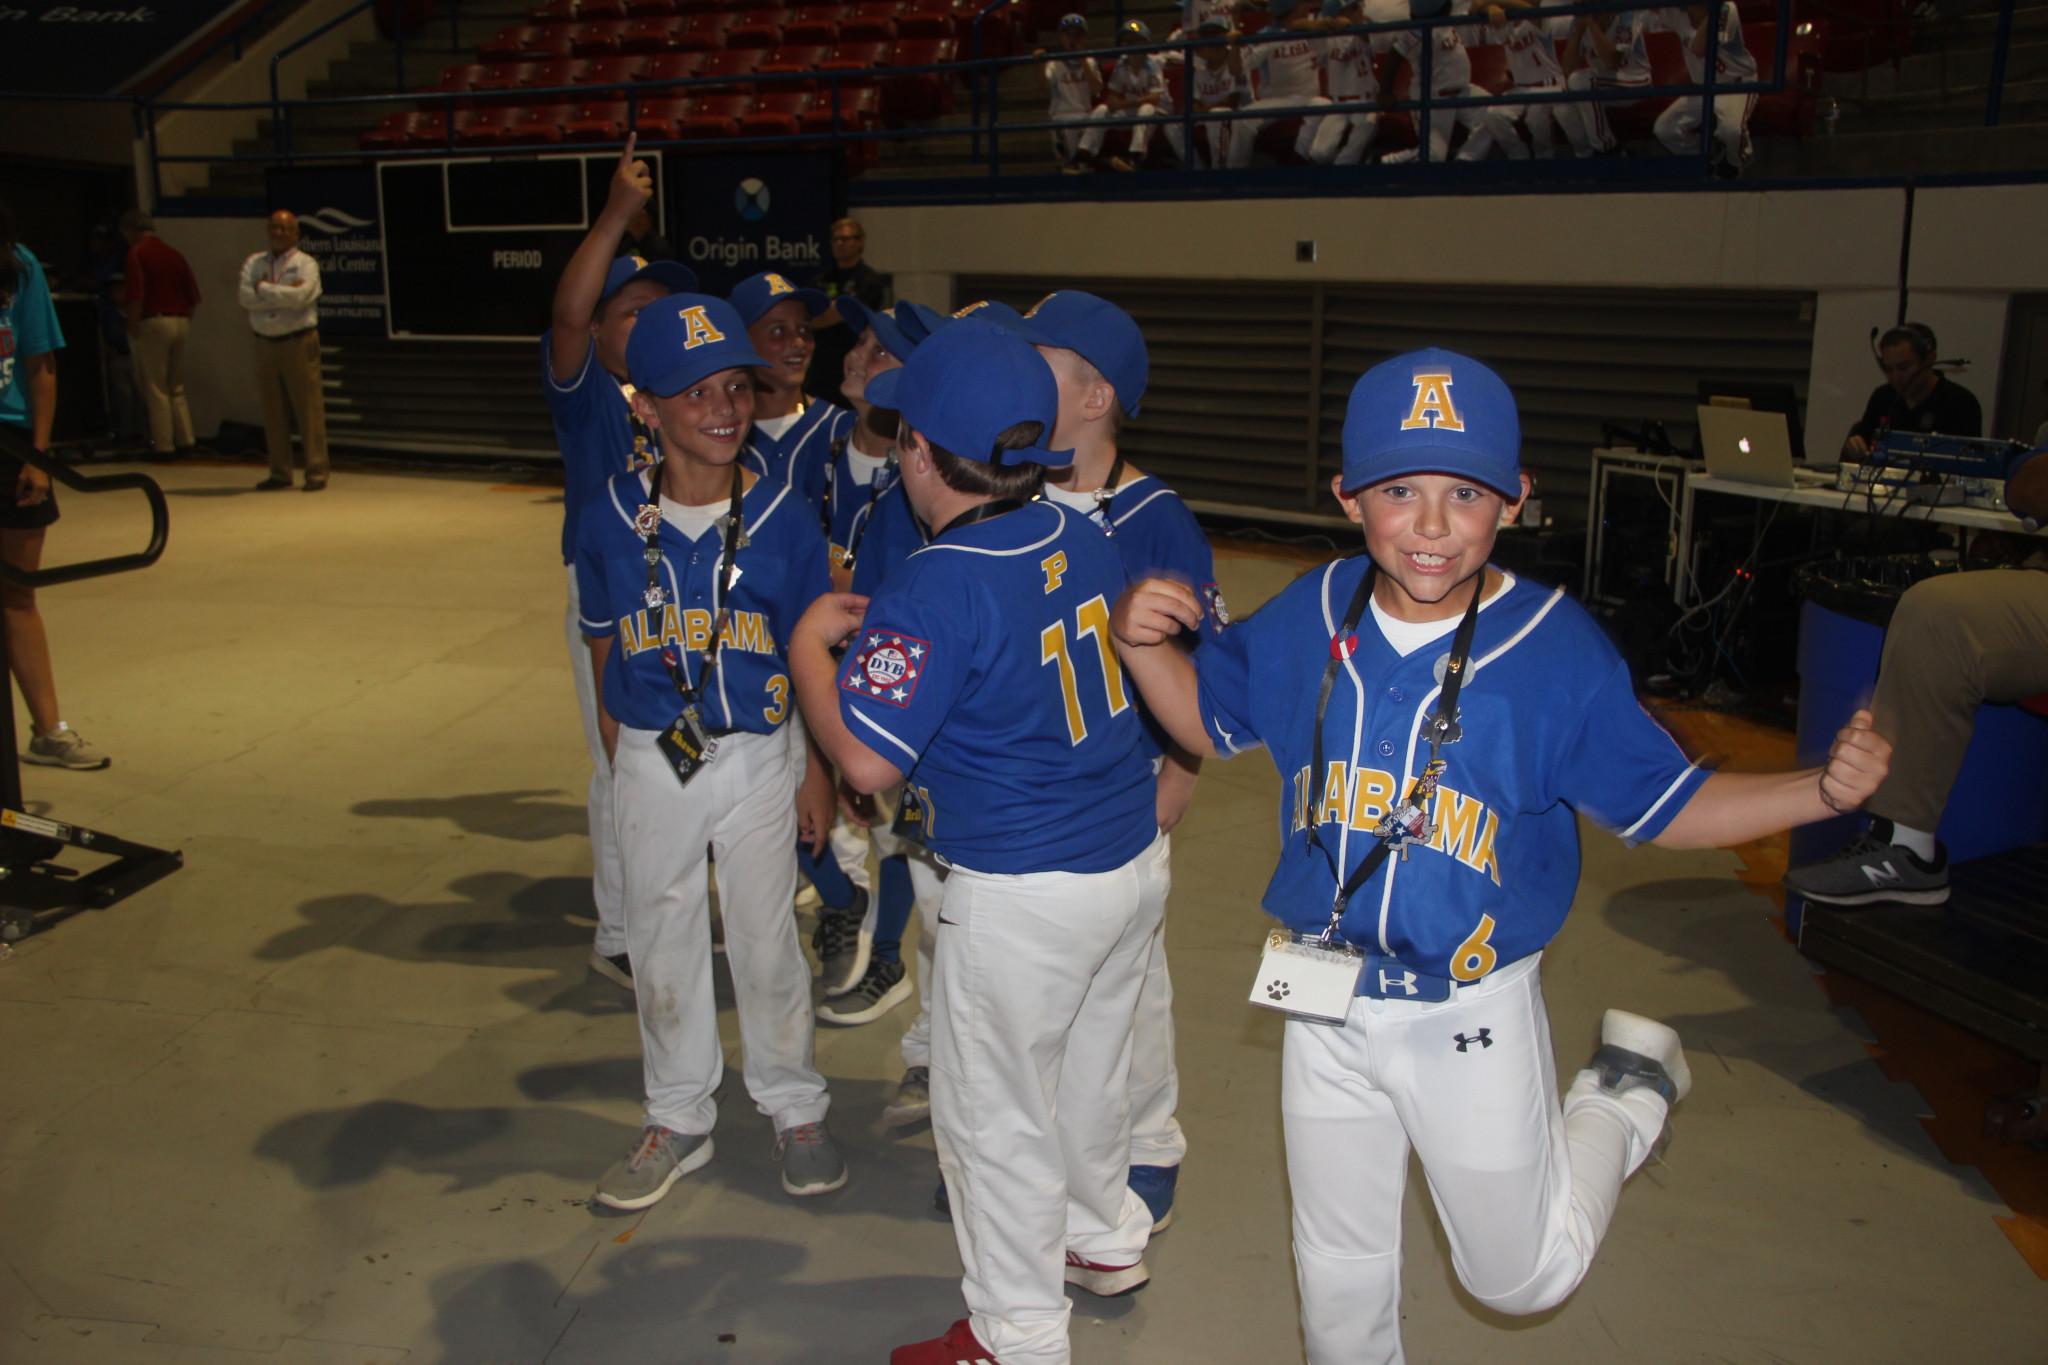 Piedmont, Alabama team